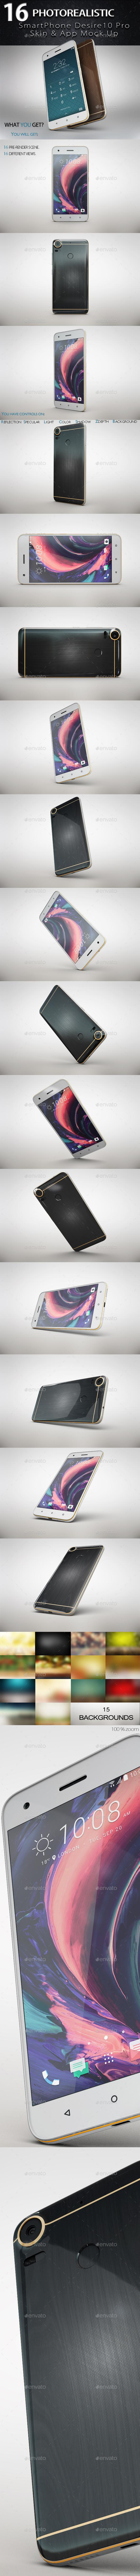 SmartPhone Desire 10 Pro App & Skin Mockup - Product Mock-Ups Graphics